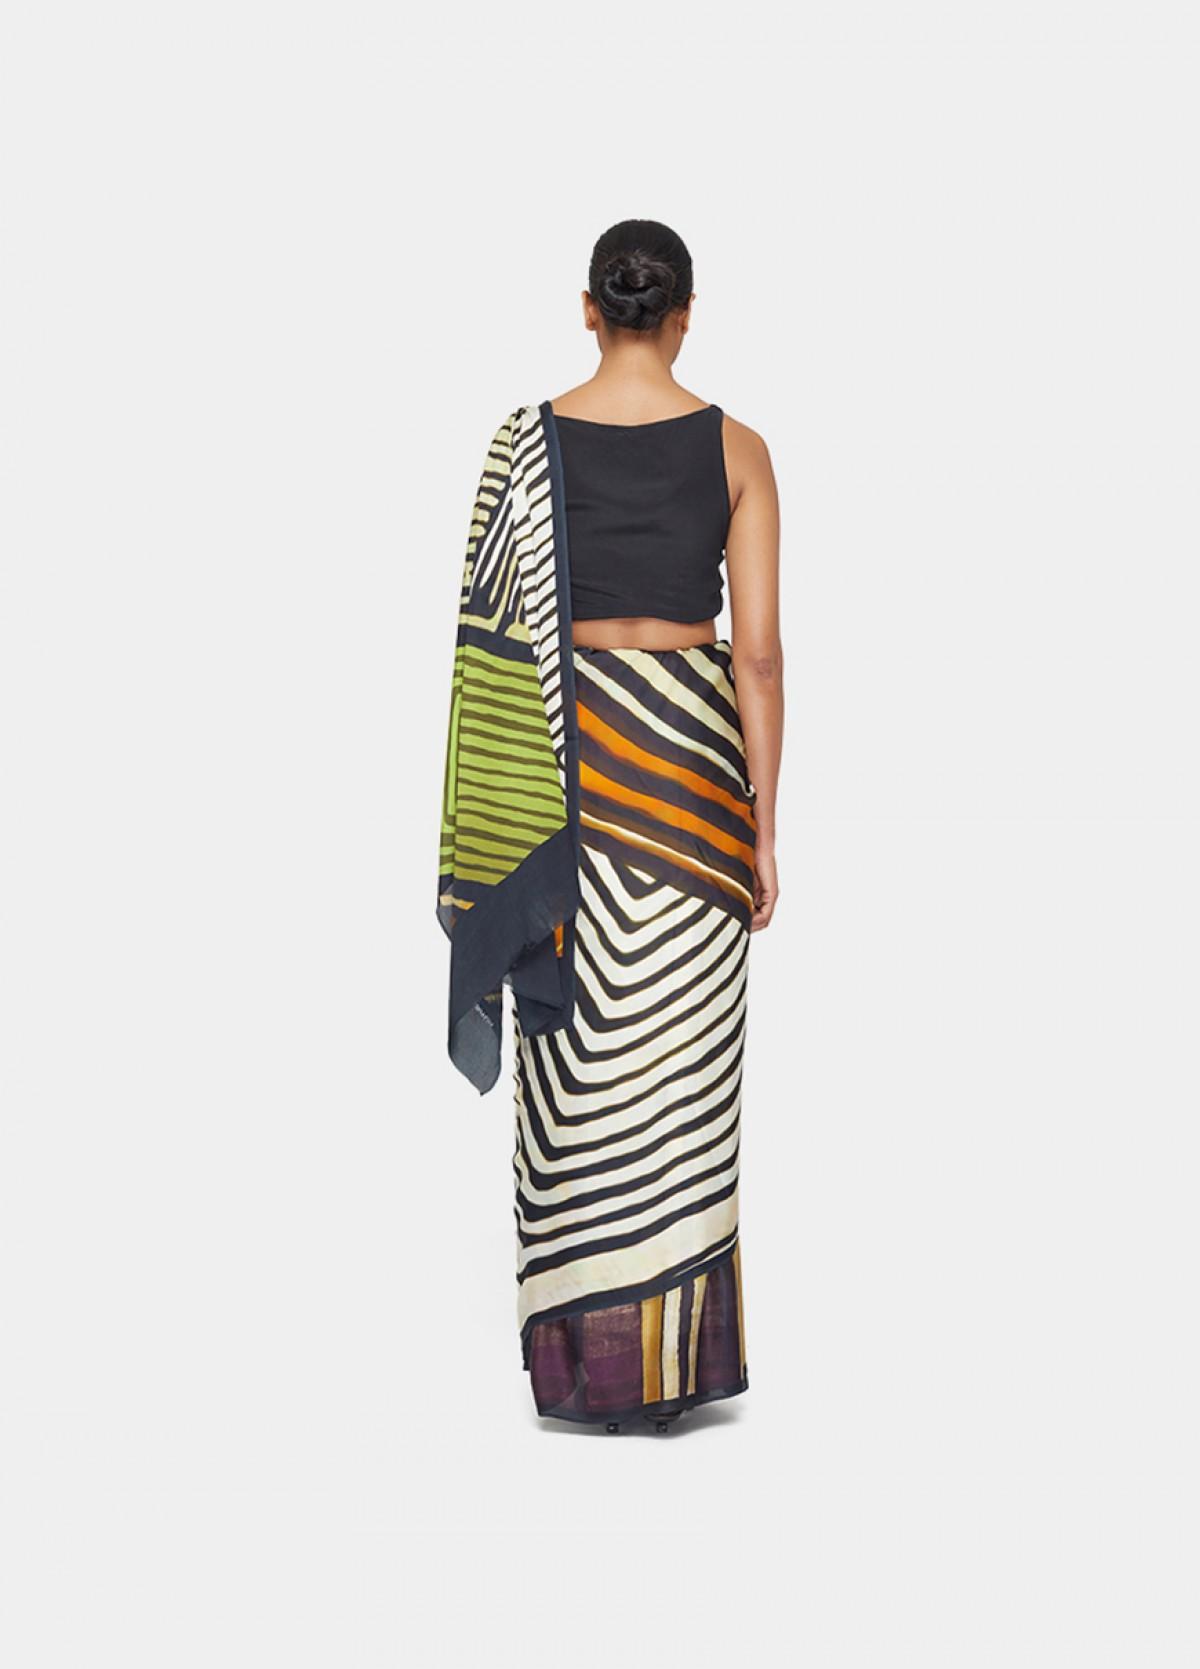 The Stripe Play Sari